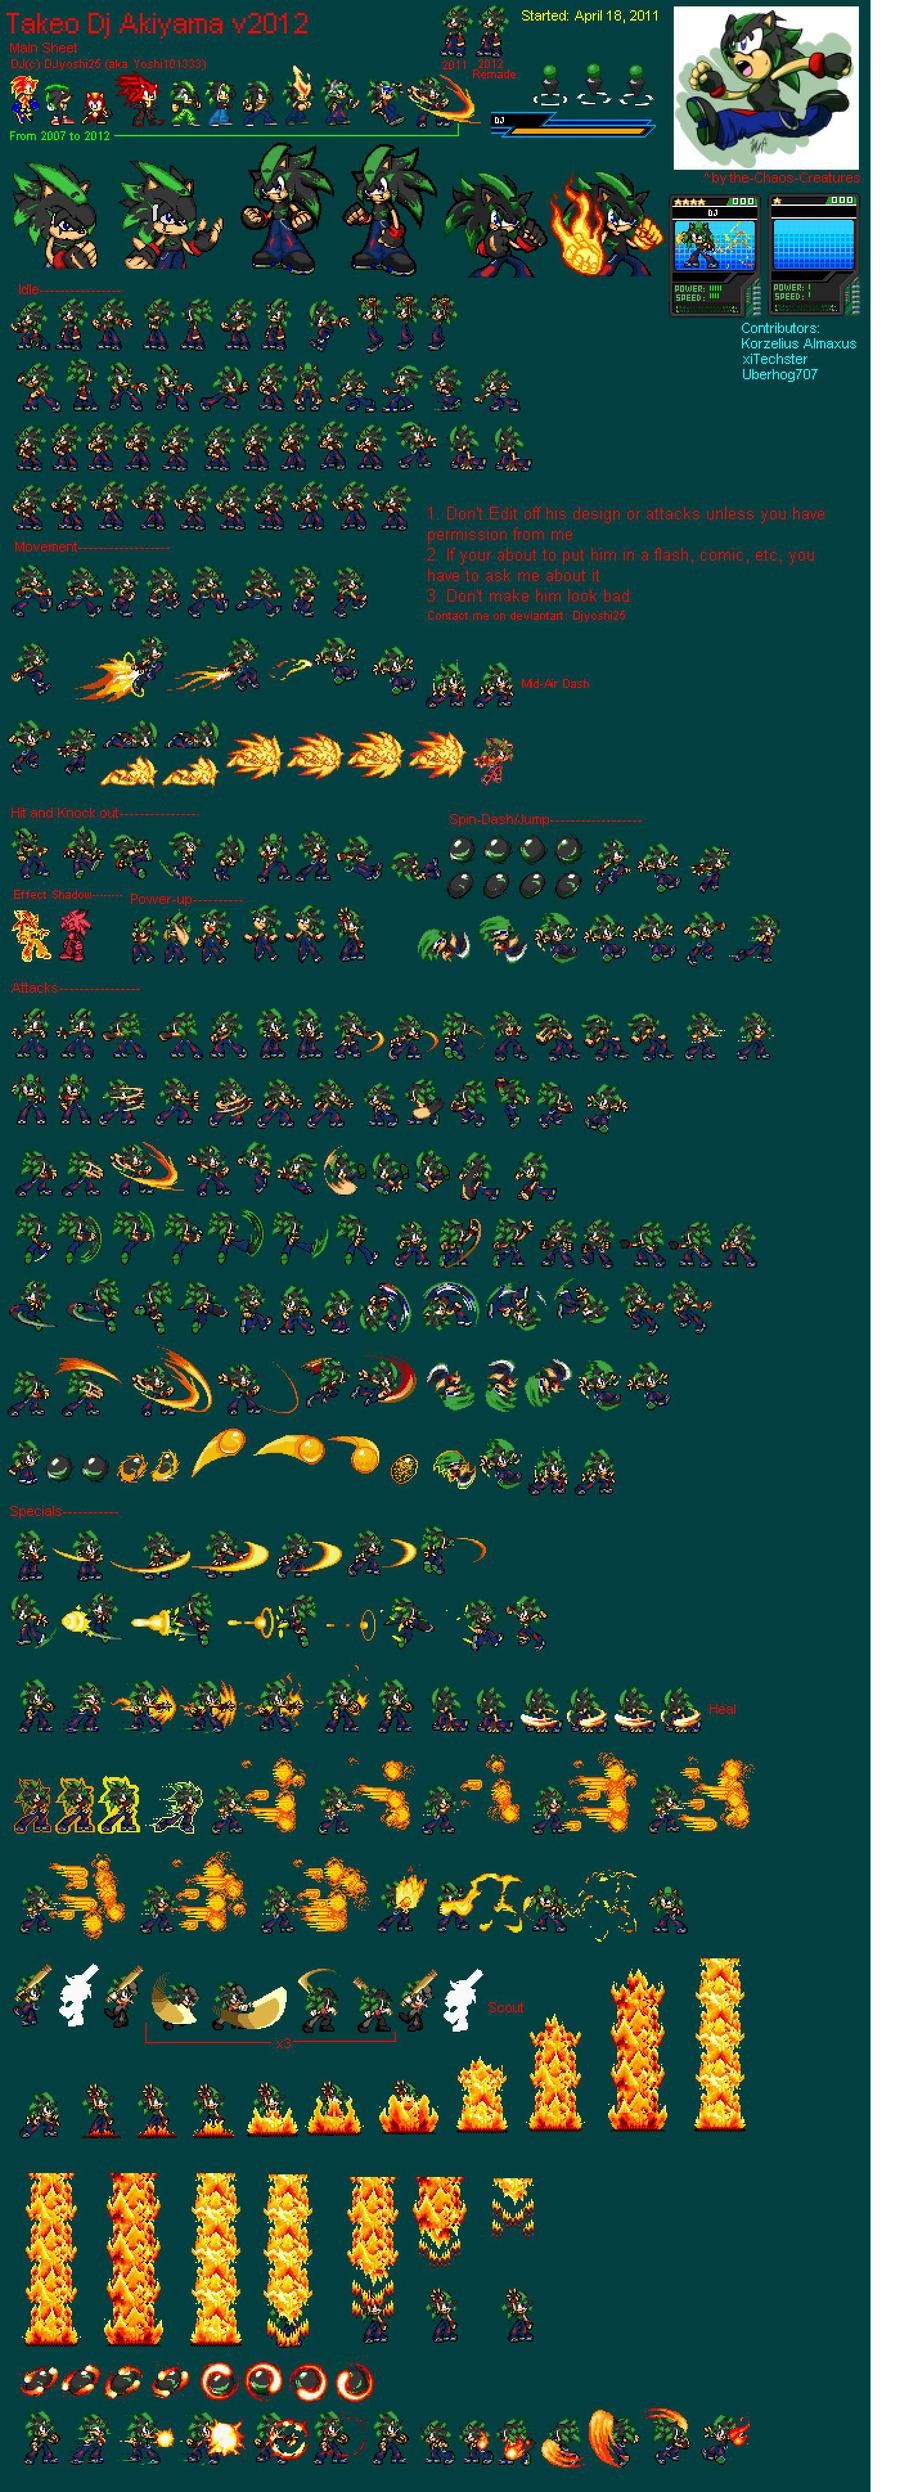 Dj - Complete Sheet by SorairoDJ